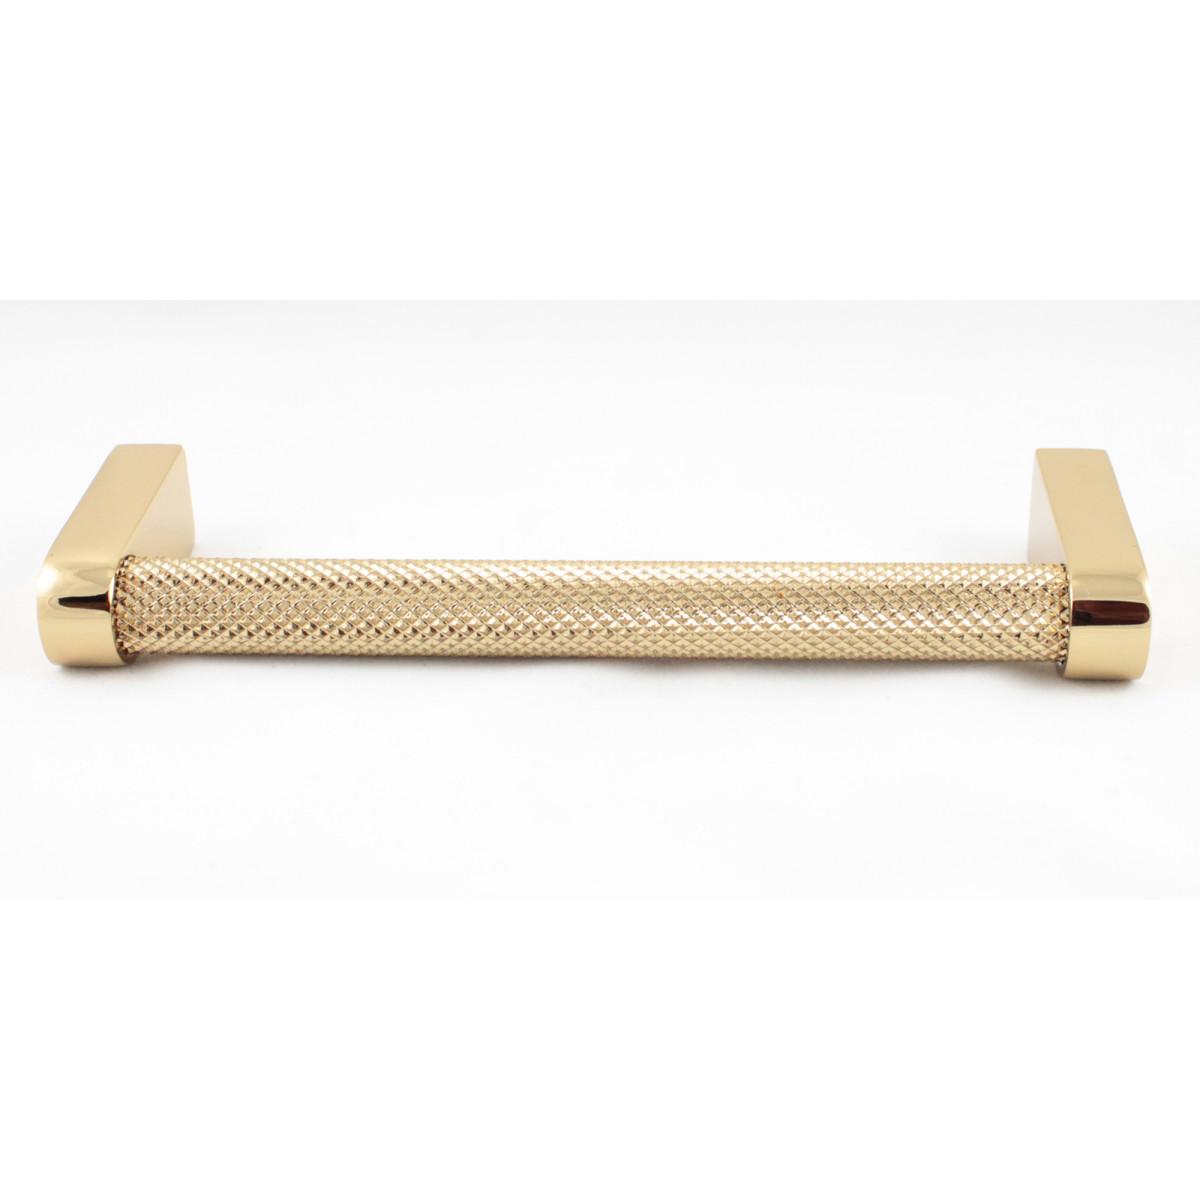 Ручка-Скоба Modda 160 Латунь Золото Cosmo-04-920-11-160